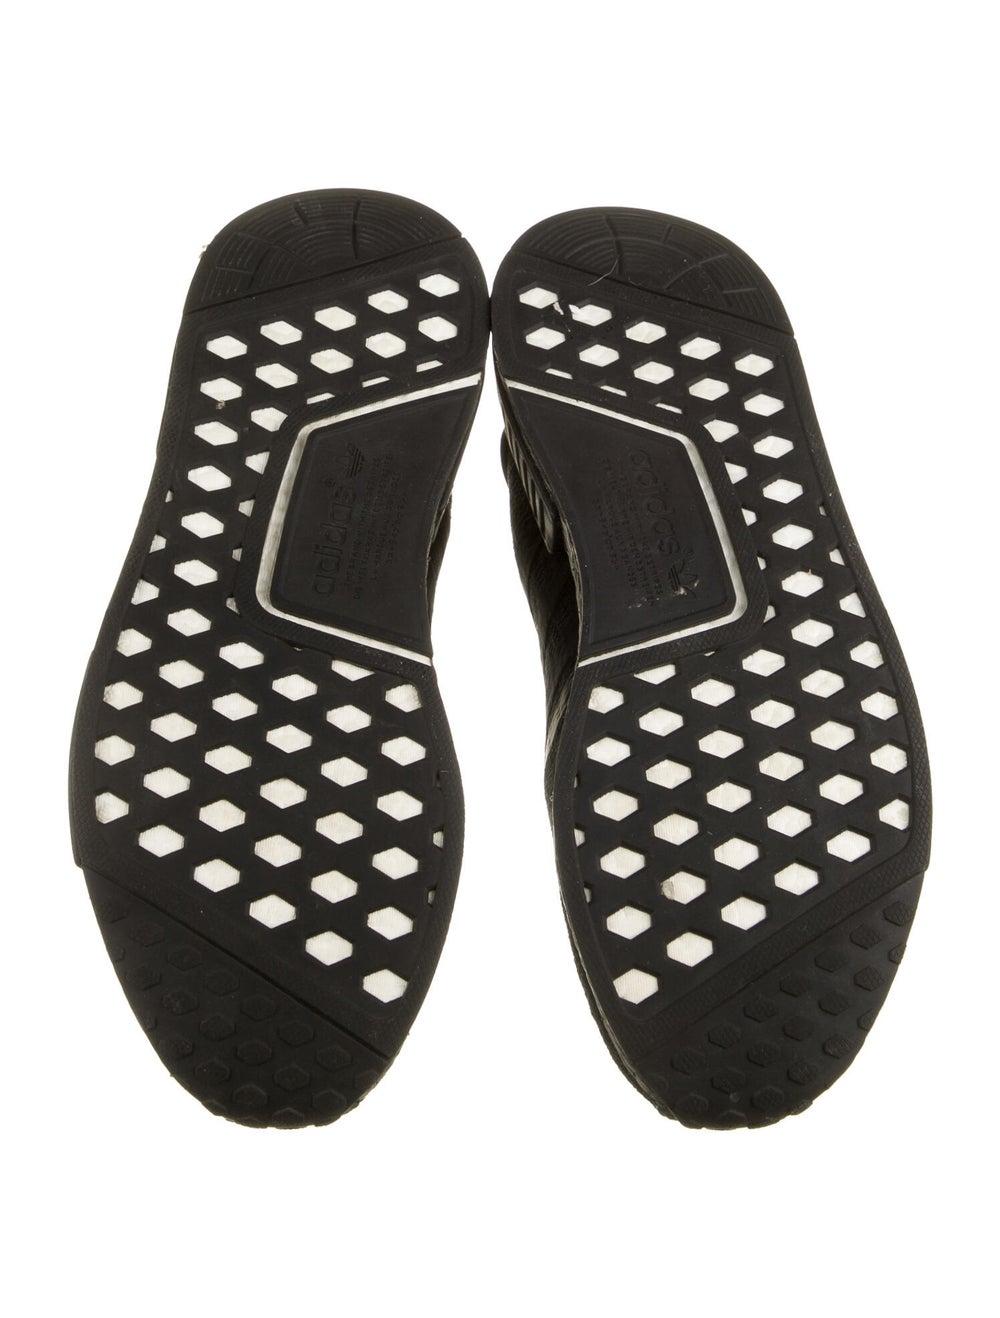 Adidas Athletic Sneakers Black - image 5